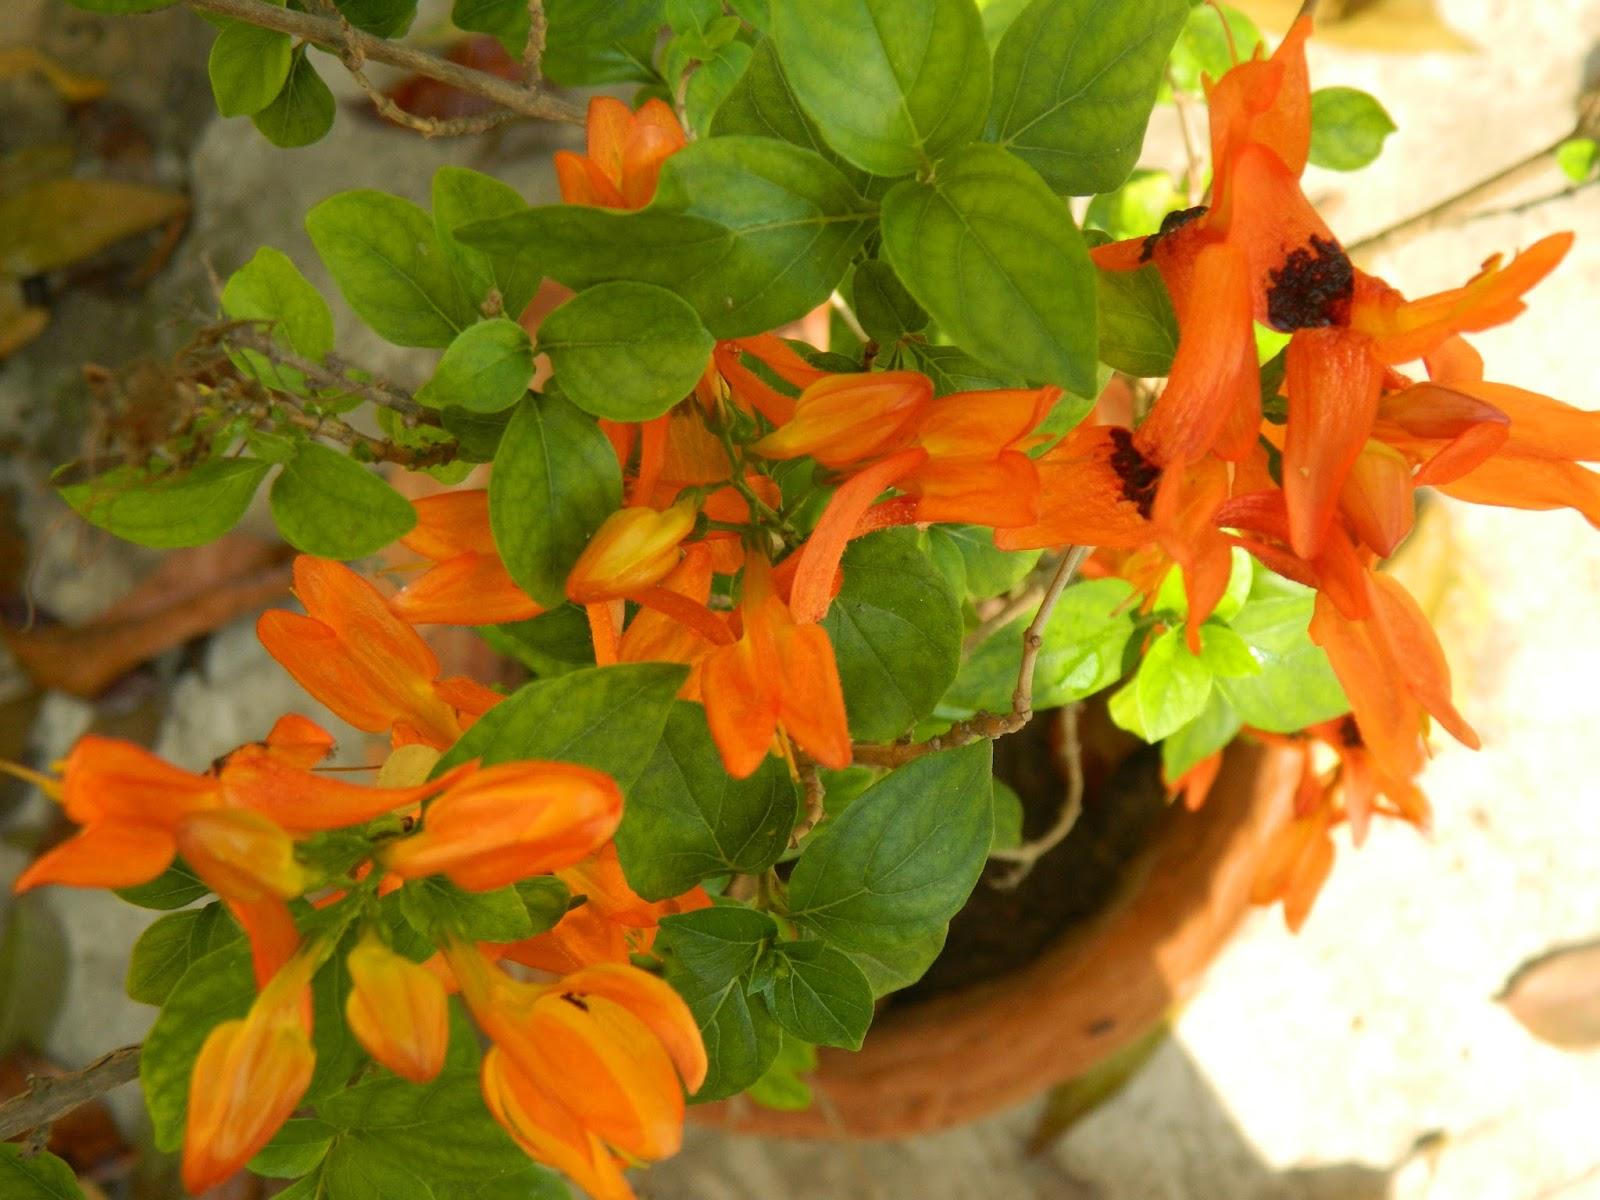 Ruttya fruticosa